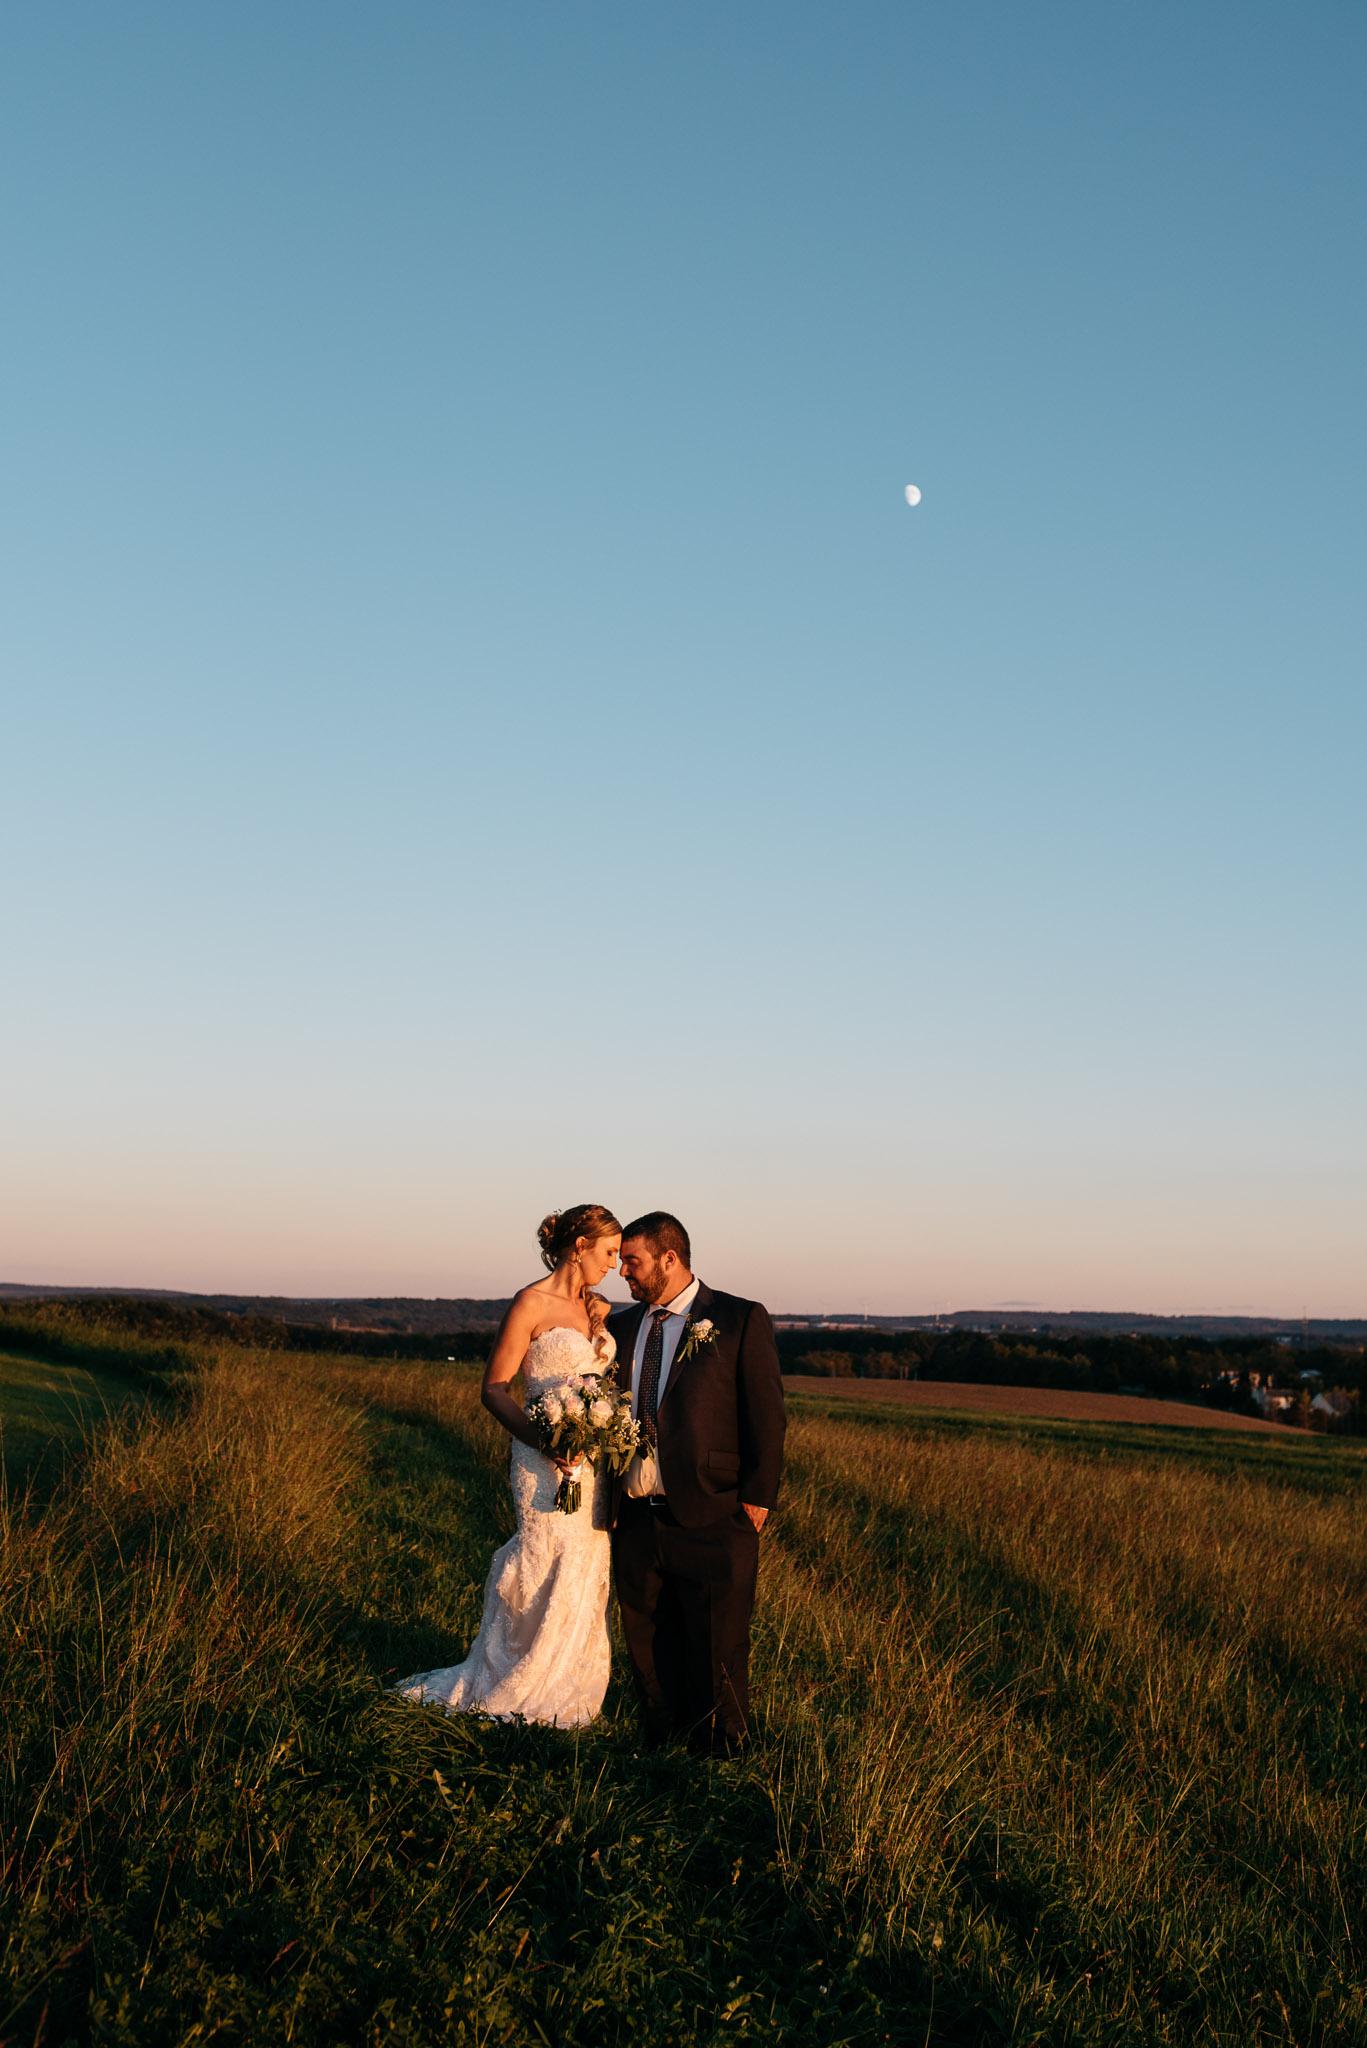 pittsburgh-ligonier-wedding-photographer-the-event-barn-at-highland-farms-56.jpg